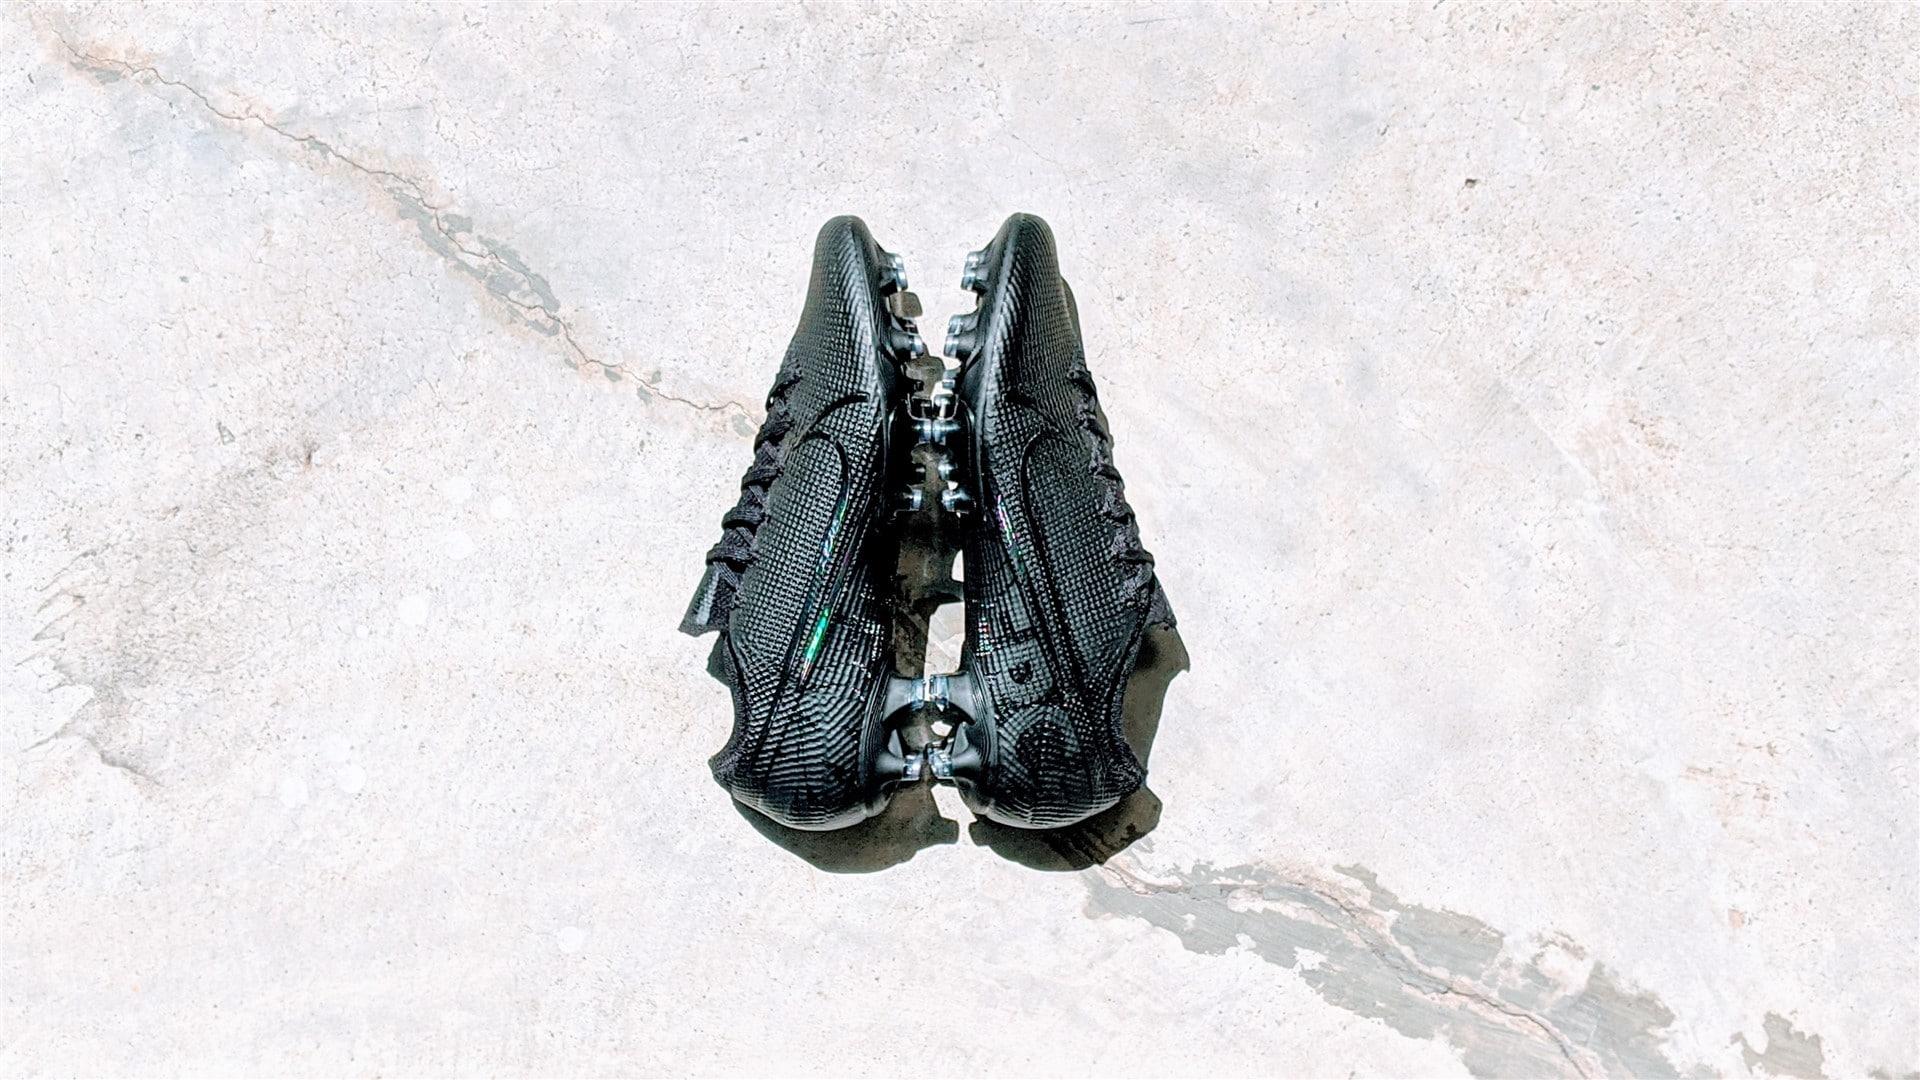 Nike Mercurial Vapor 13 review